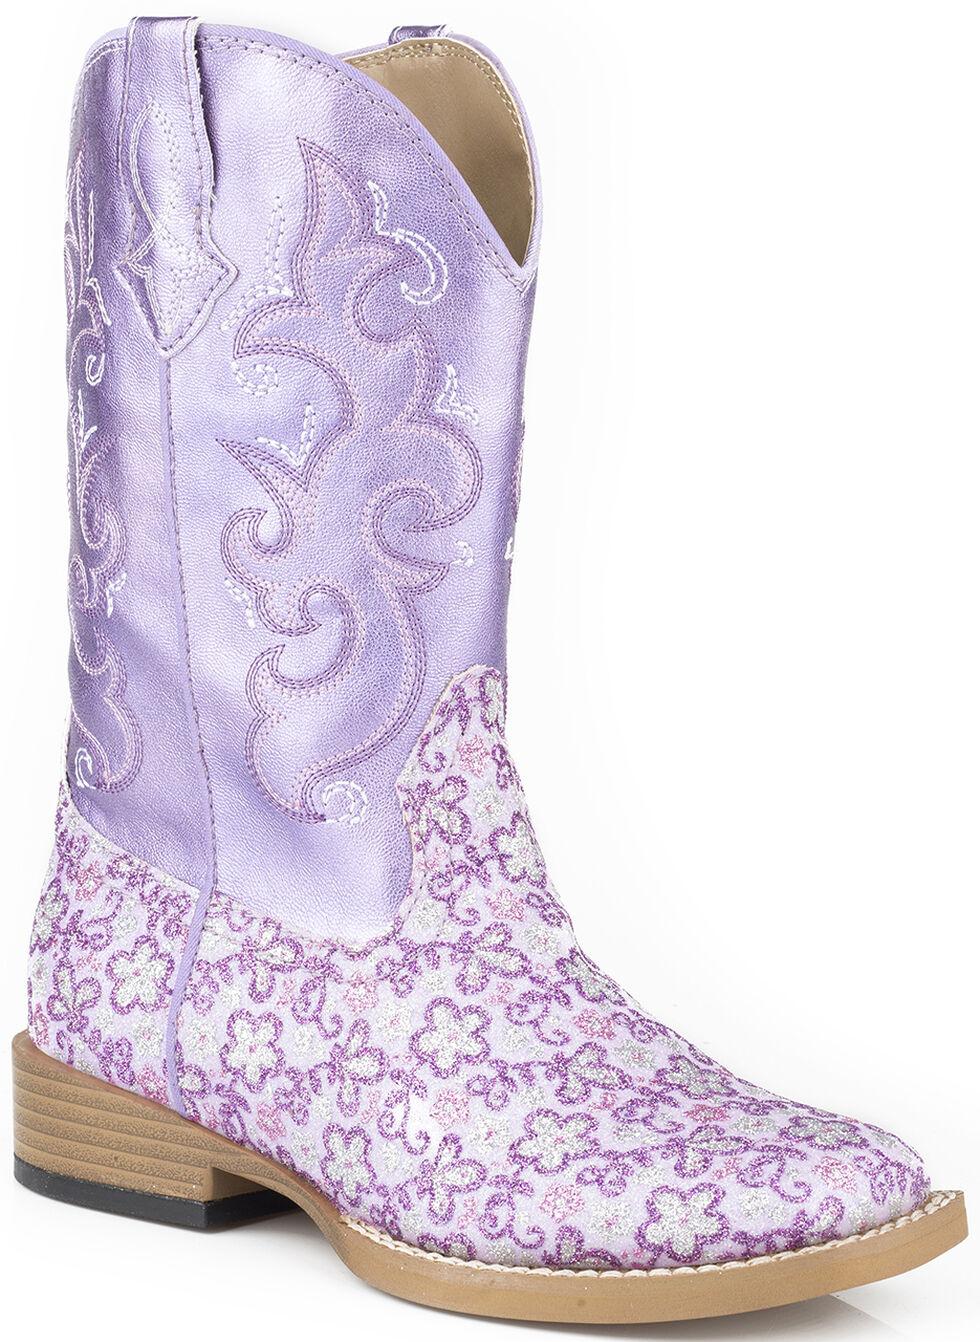 Roper Girls' Lavender Floral Glitter Cowgirl Boots - Square Toe , Purple, hi-res